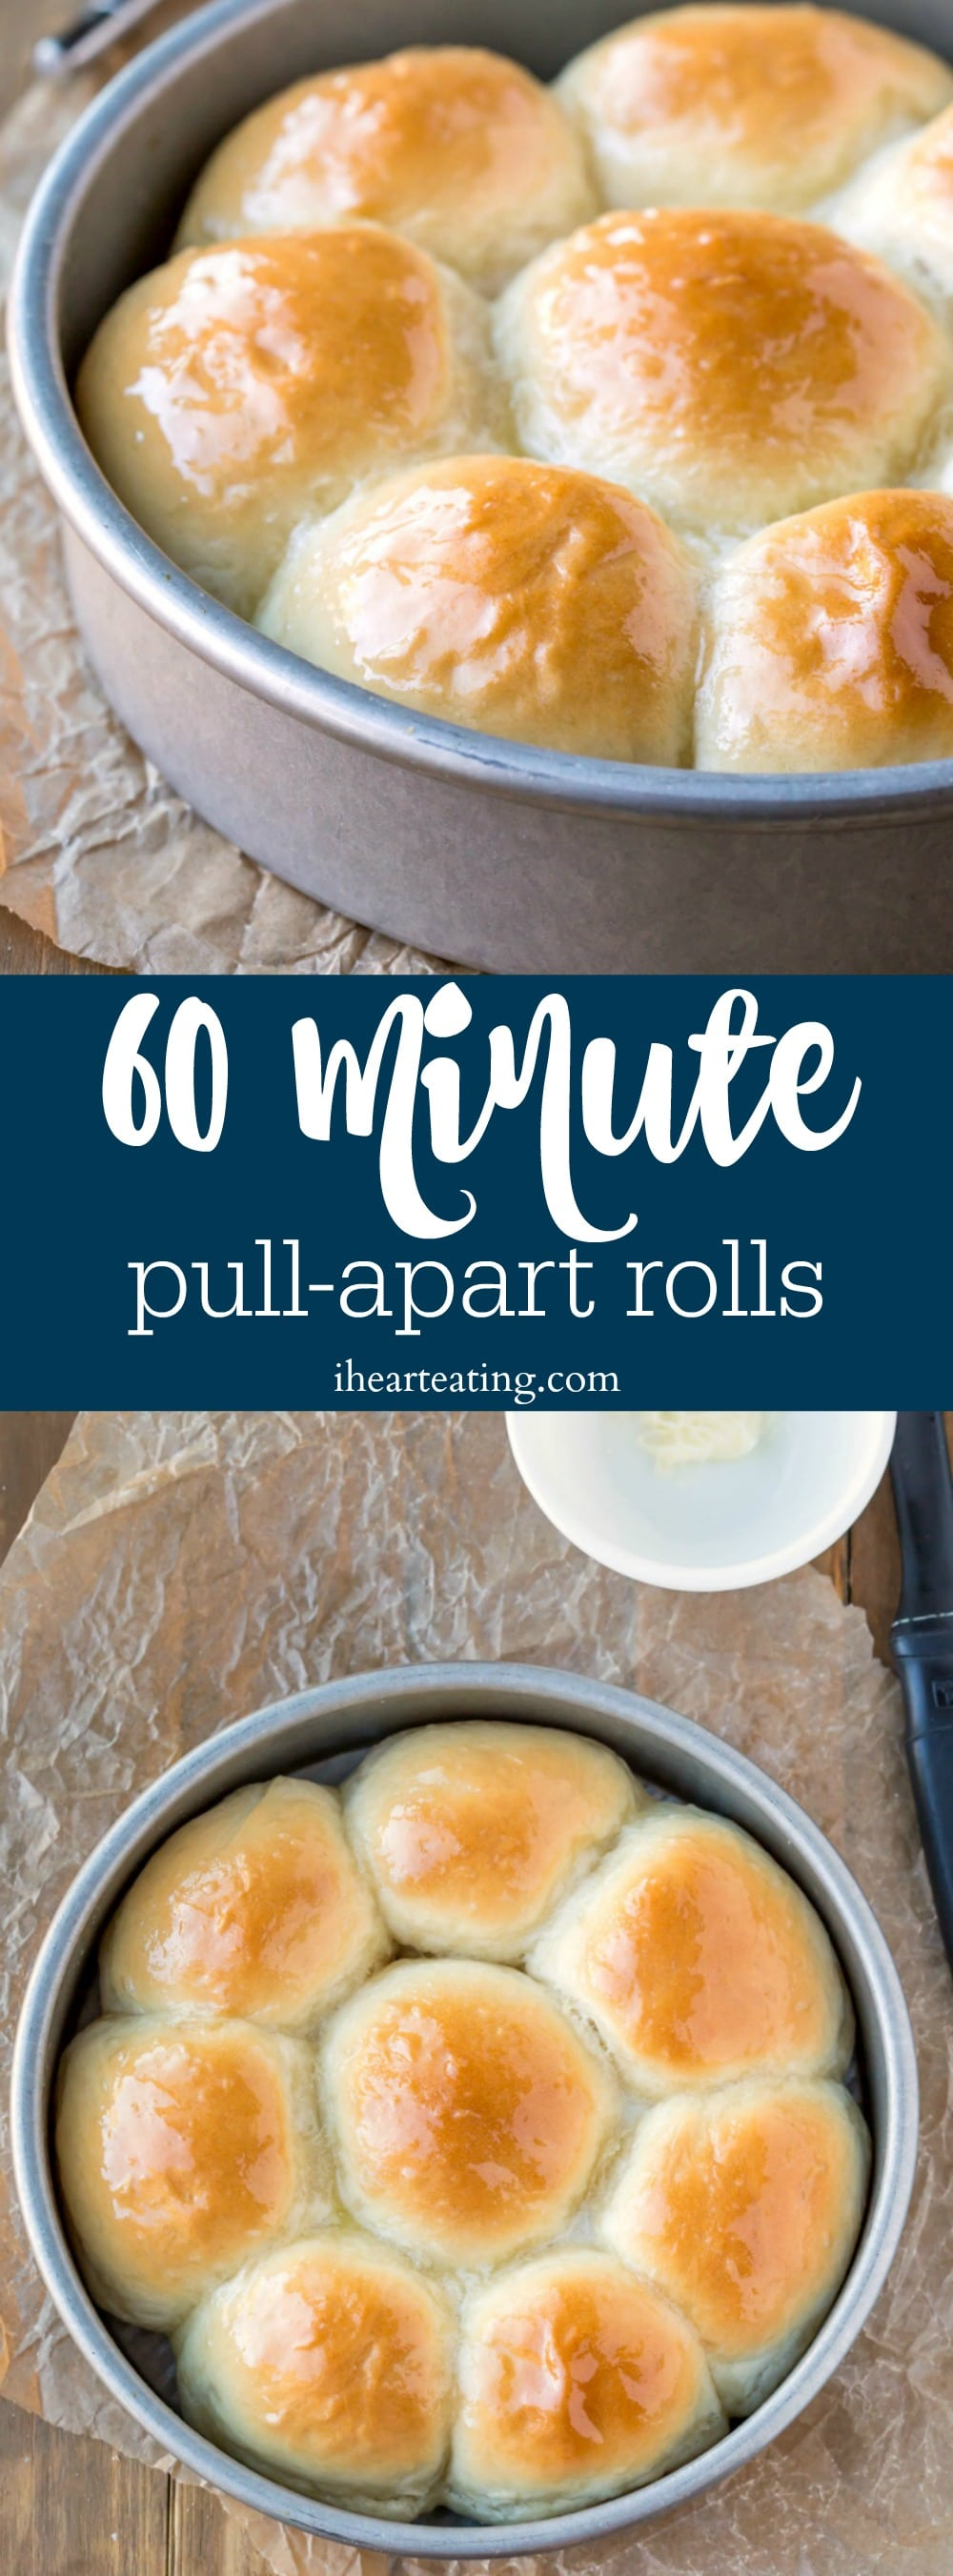 60 Minute Pull-Apart Rolls